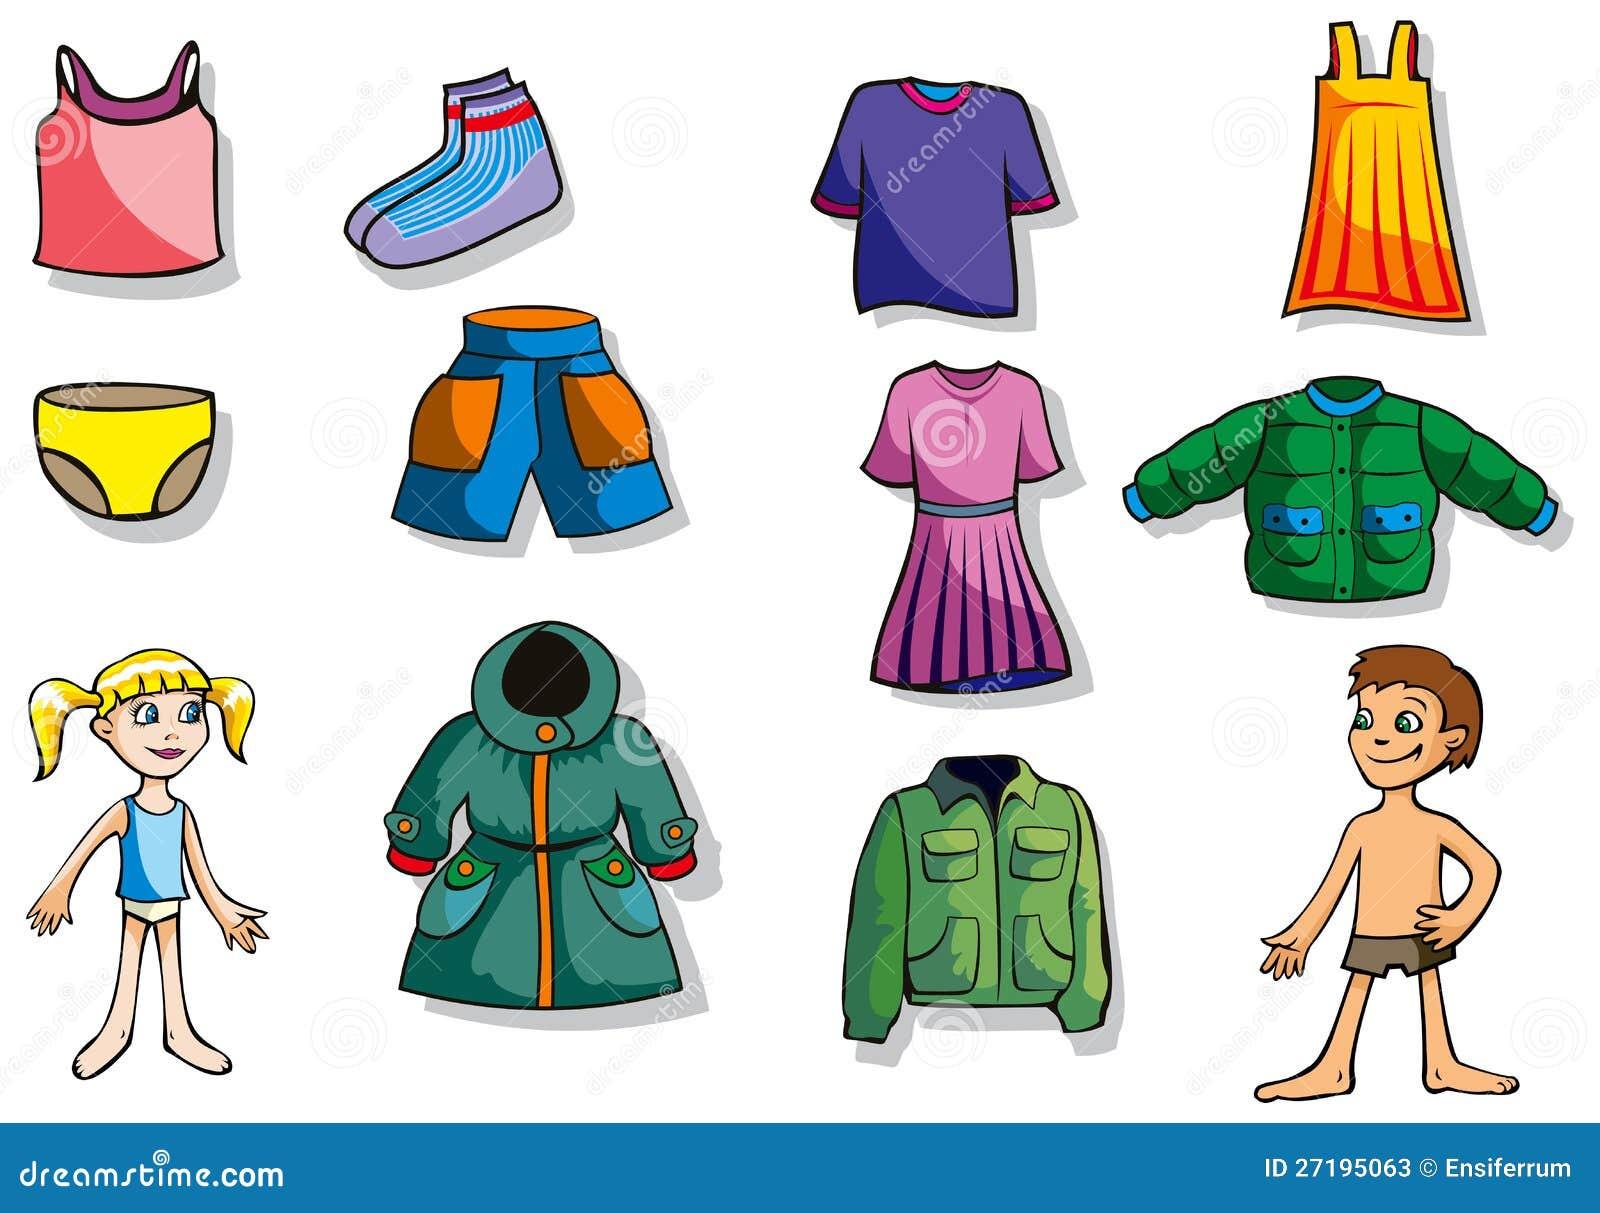 Set Of Children Clothes Stock Photos - Image: 27195063: http://www.dreamstime.com/stock-photos-set-children-clothes-image27195063